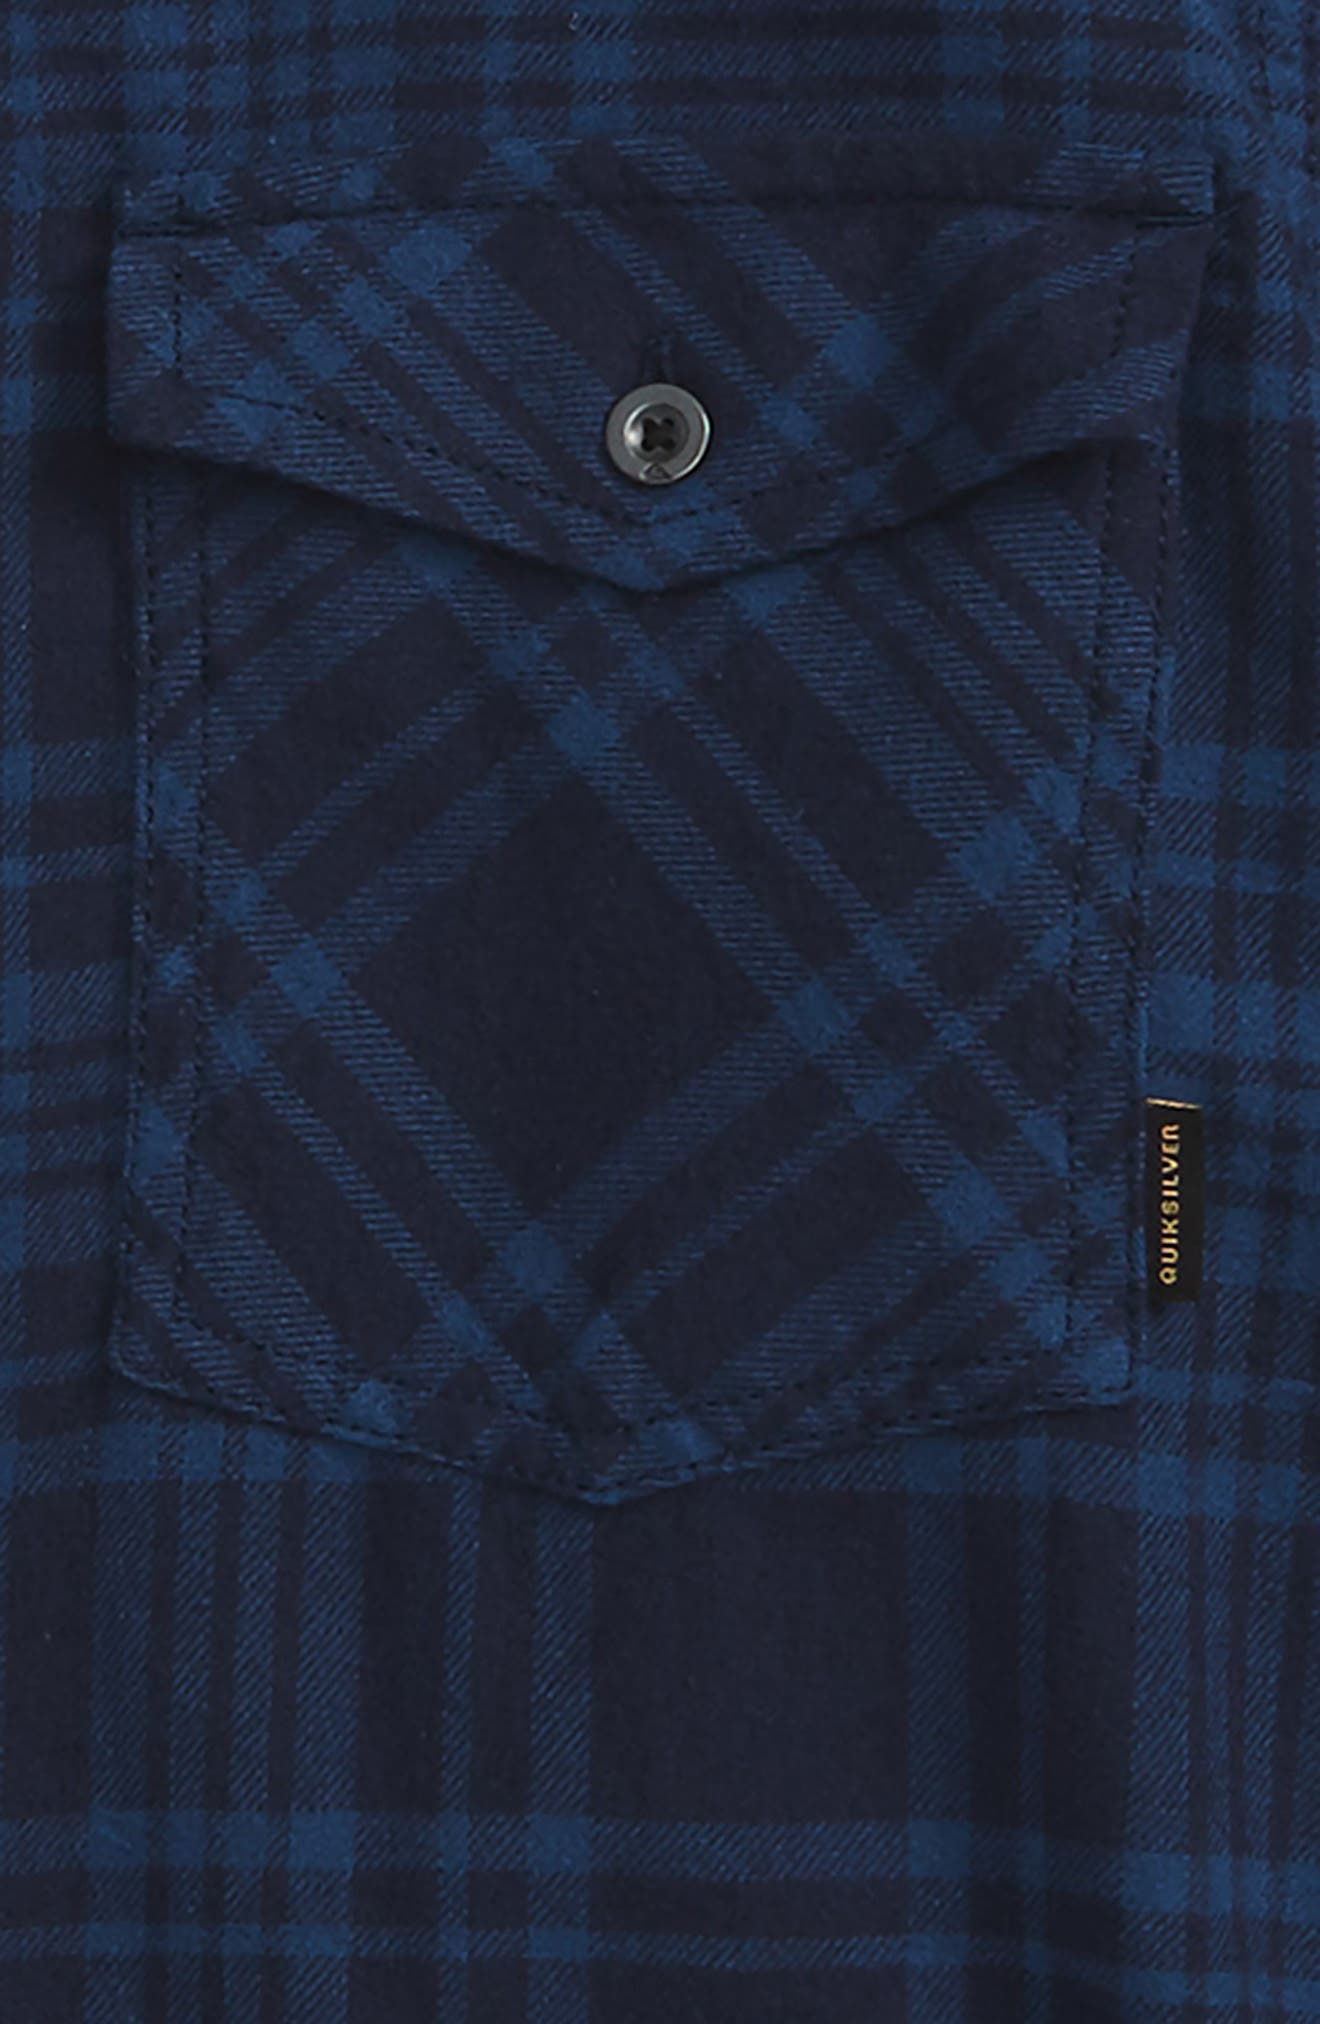 Hooded Plaid Woven Shirt,                             Alternate thumbnail 4, color,